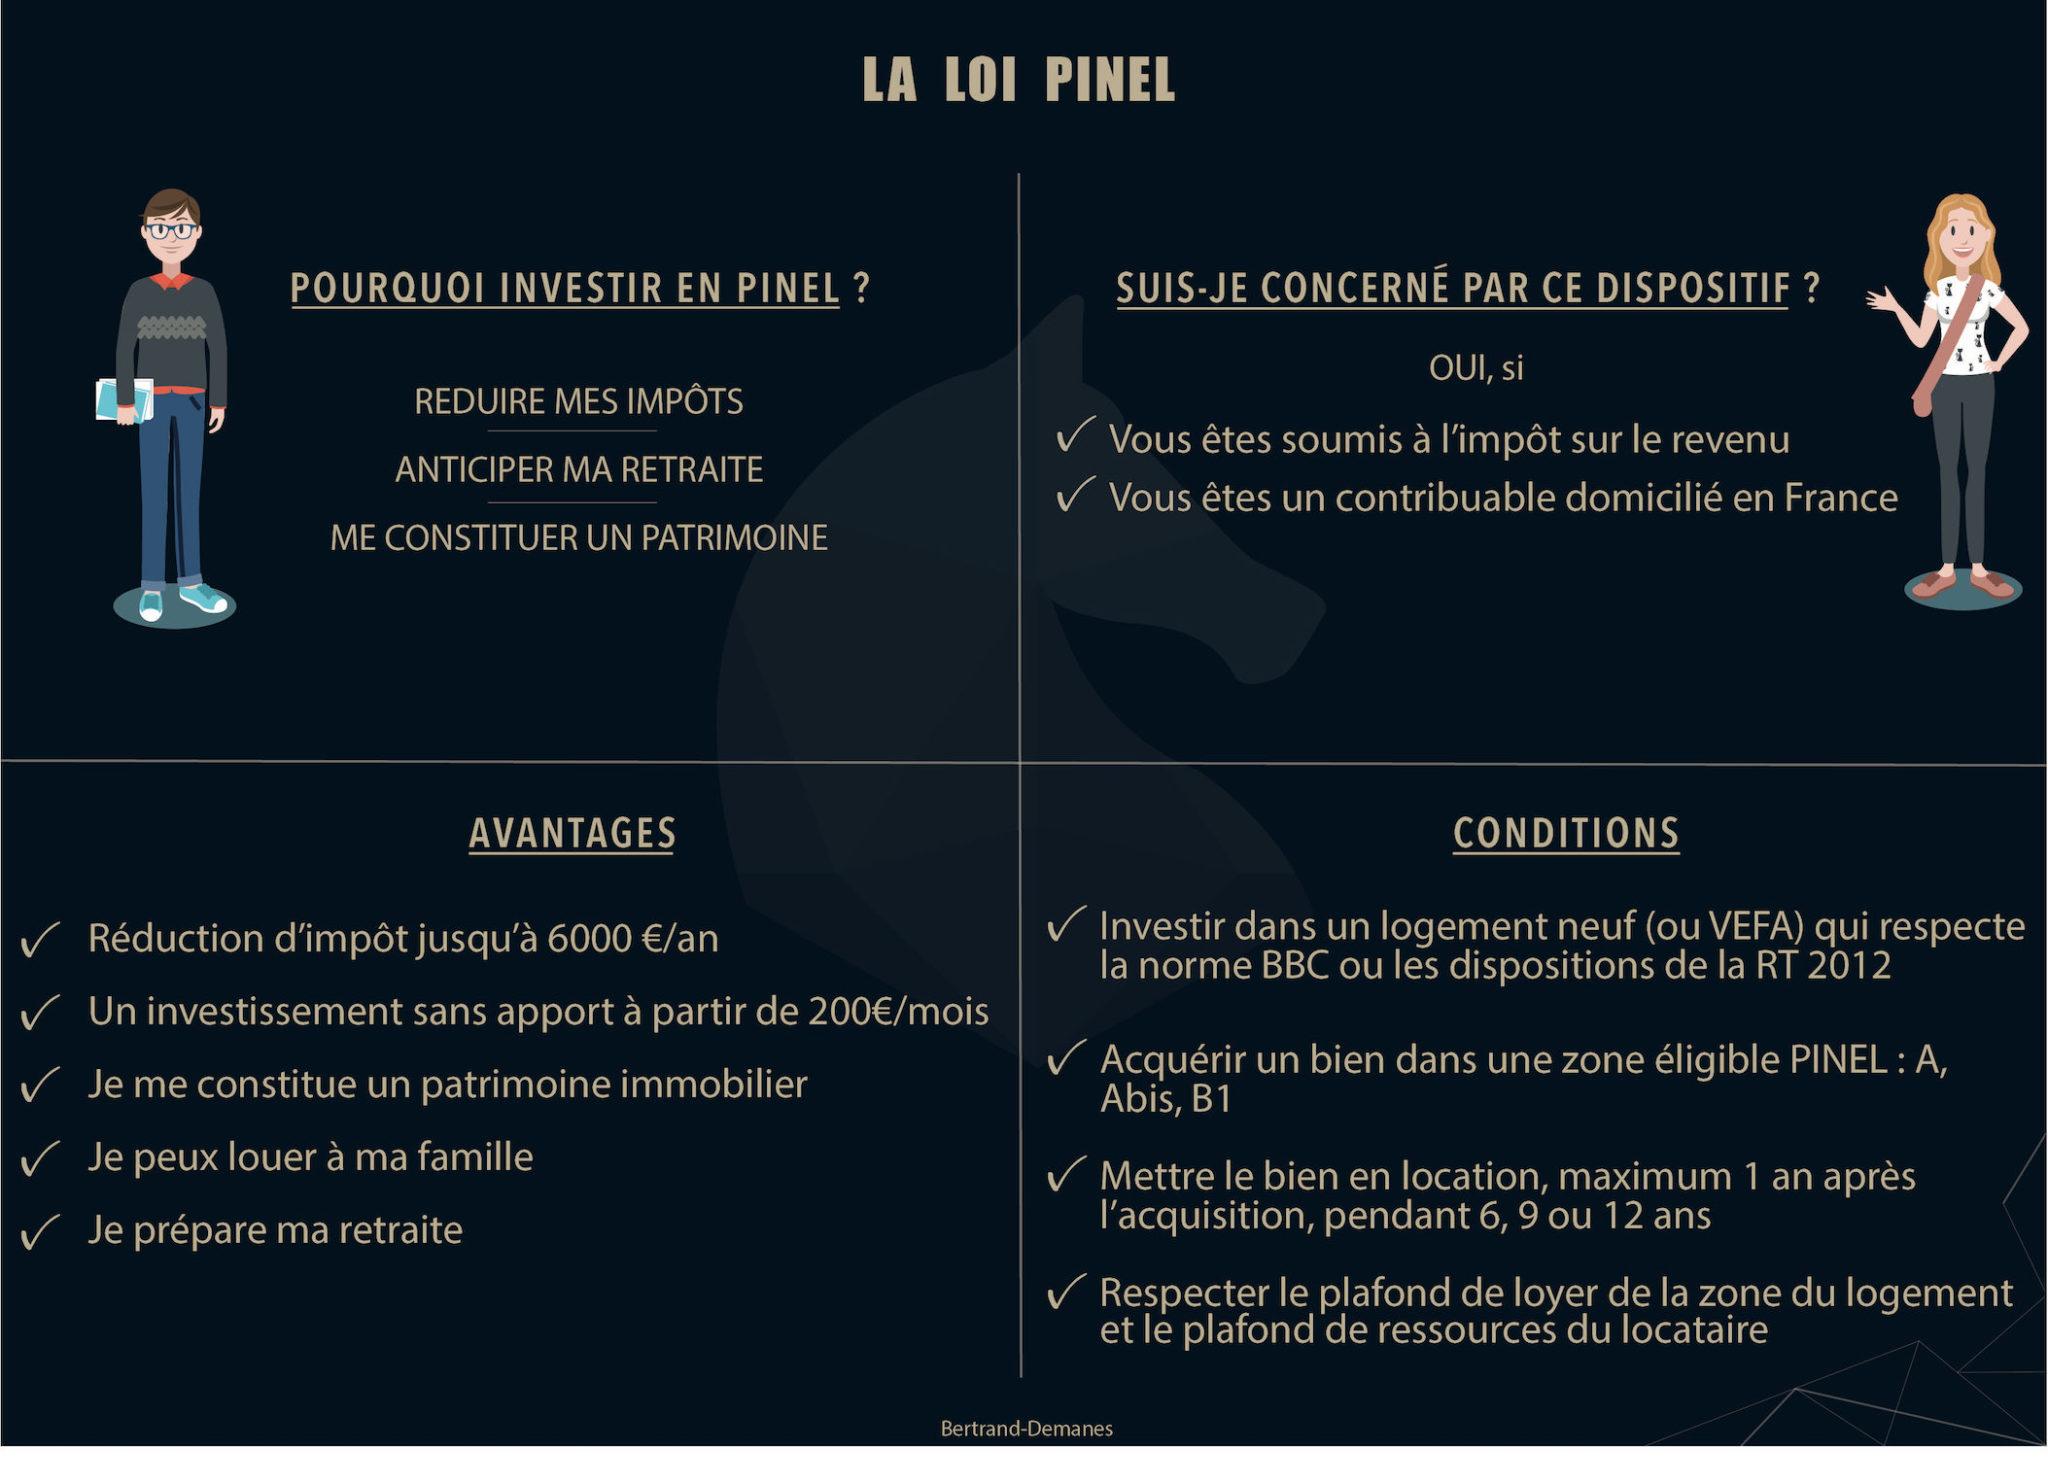 infographie-loi-pinel-lille-bertrand-demanes